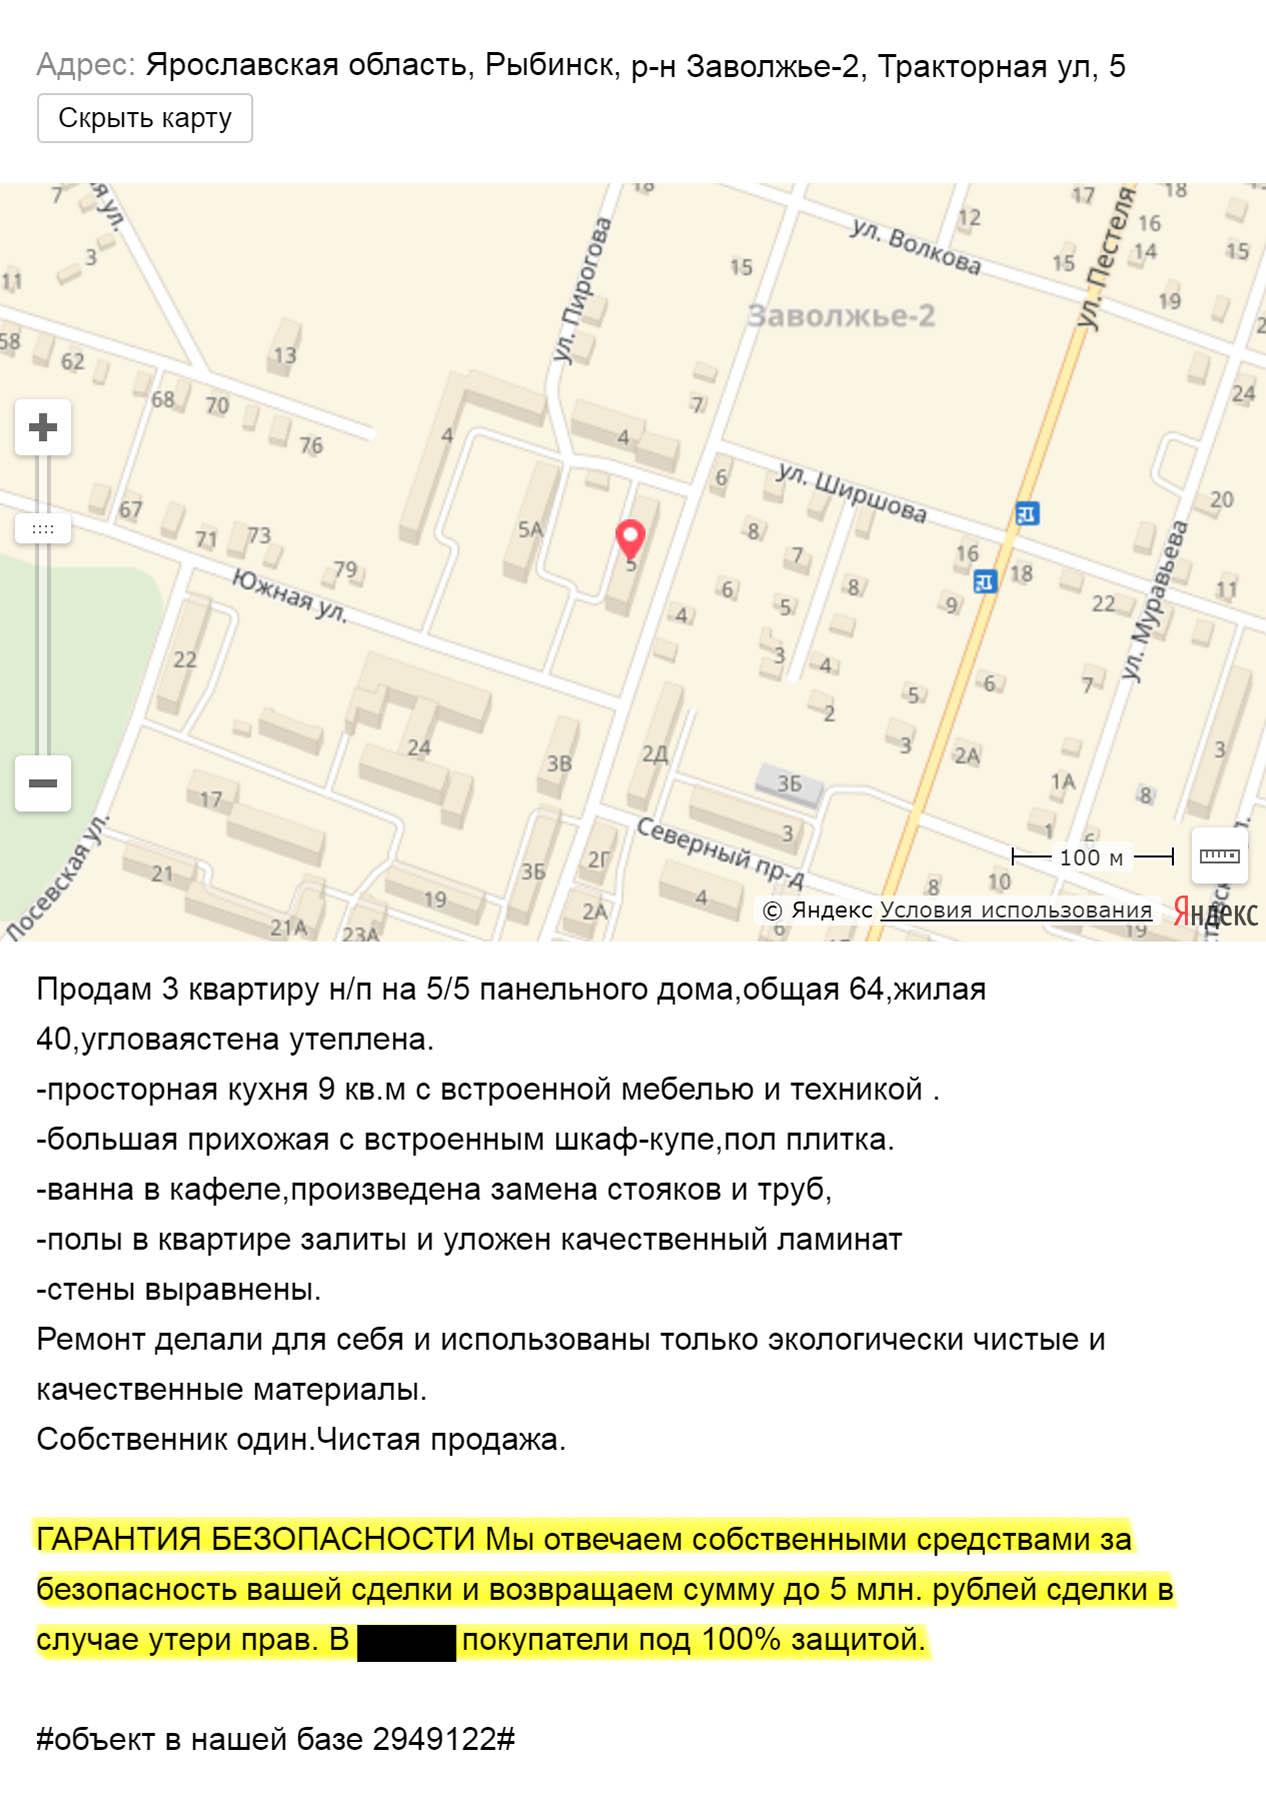 В объявлении на «Авито» агентство пишет, что застраховано и сумма страховки — 5 млн рублей